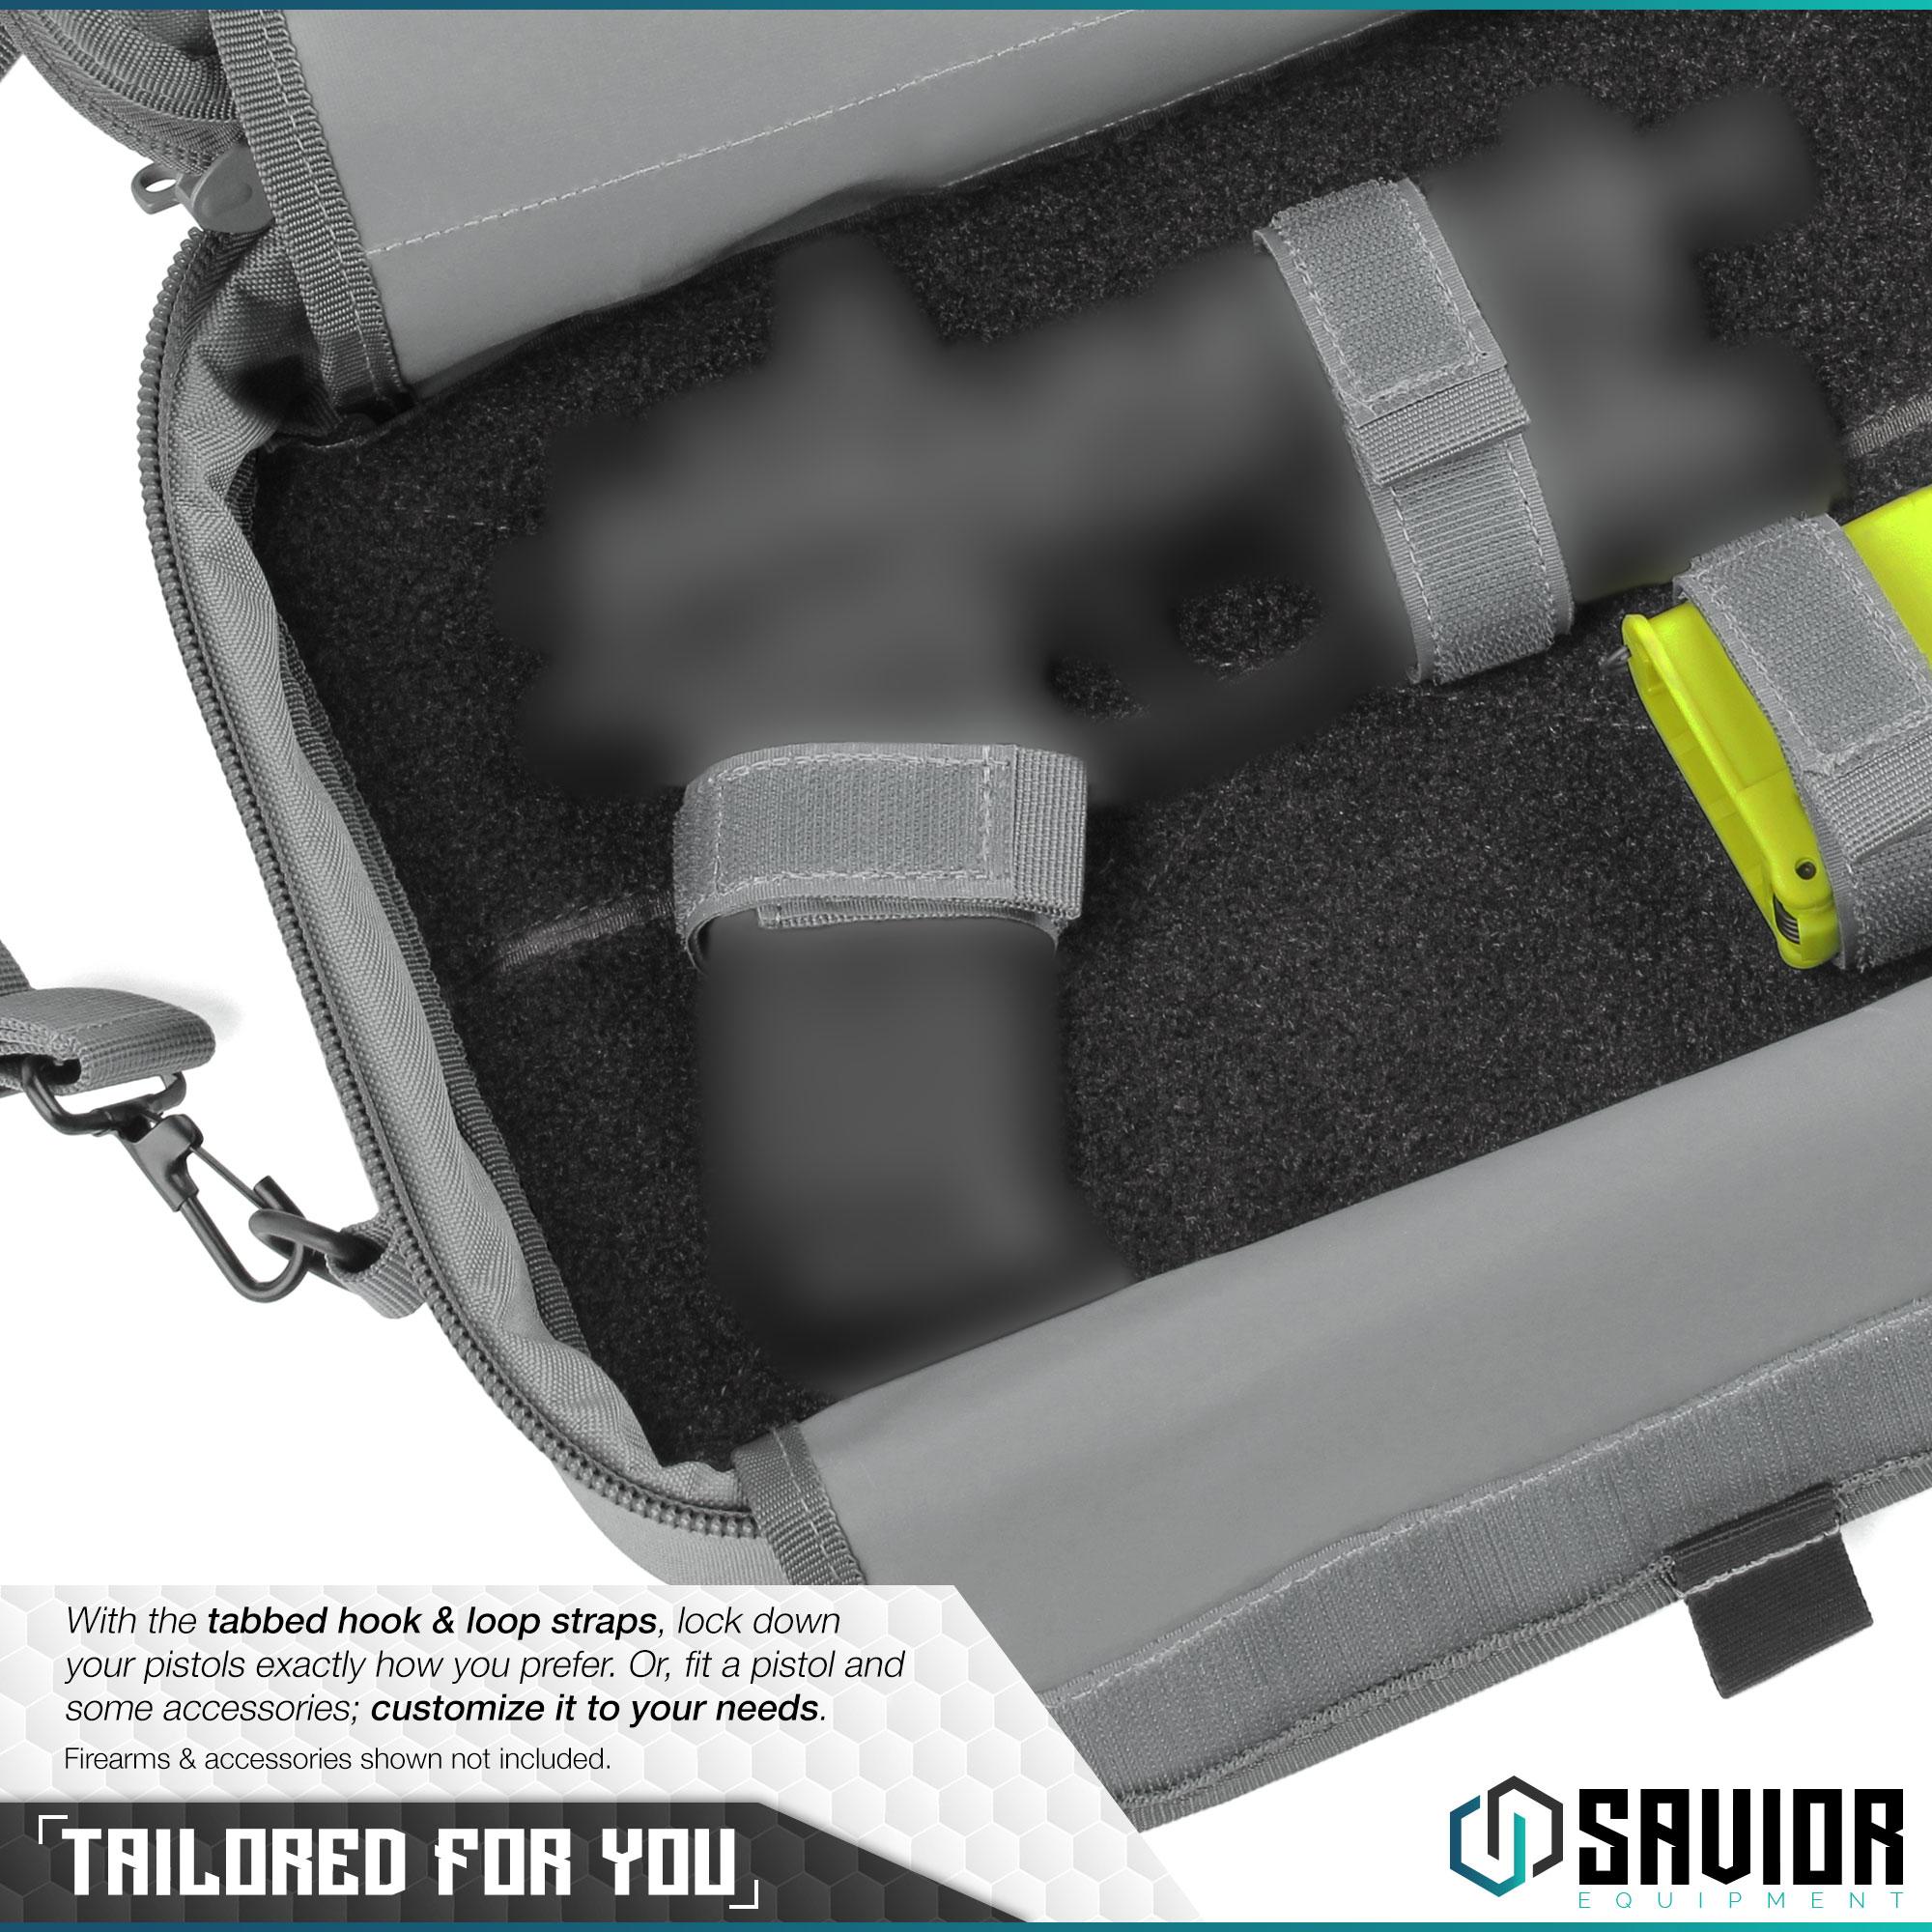 034-SAVIOR-034-Padded-Discreet-Double-Handgun-Bag-Pistol-Storage-Case-w-Mag-Pouch-Slot thumbnail 4